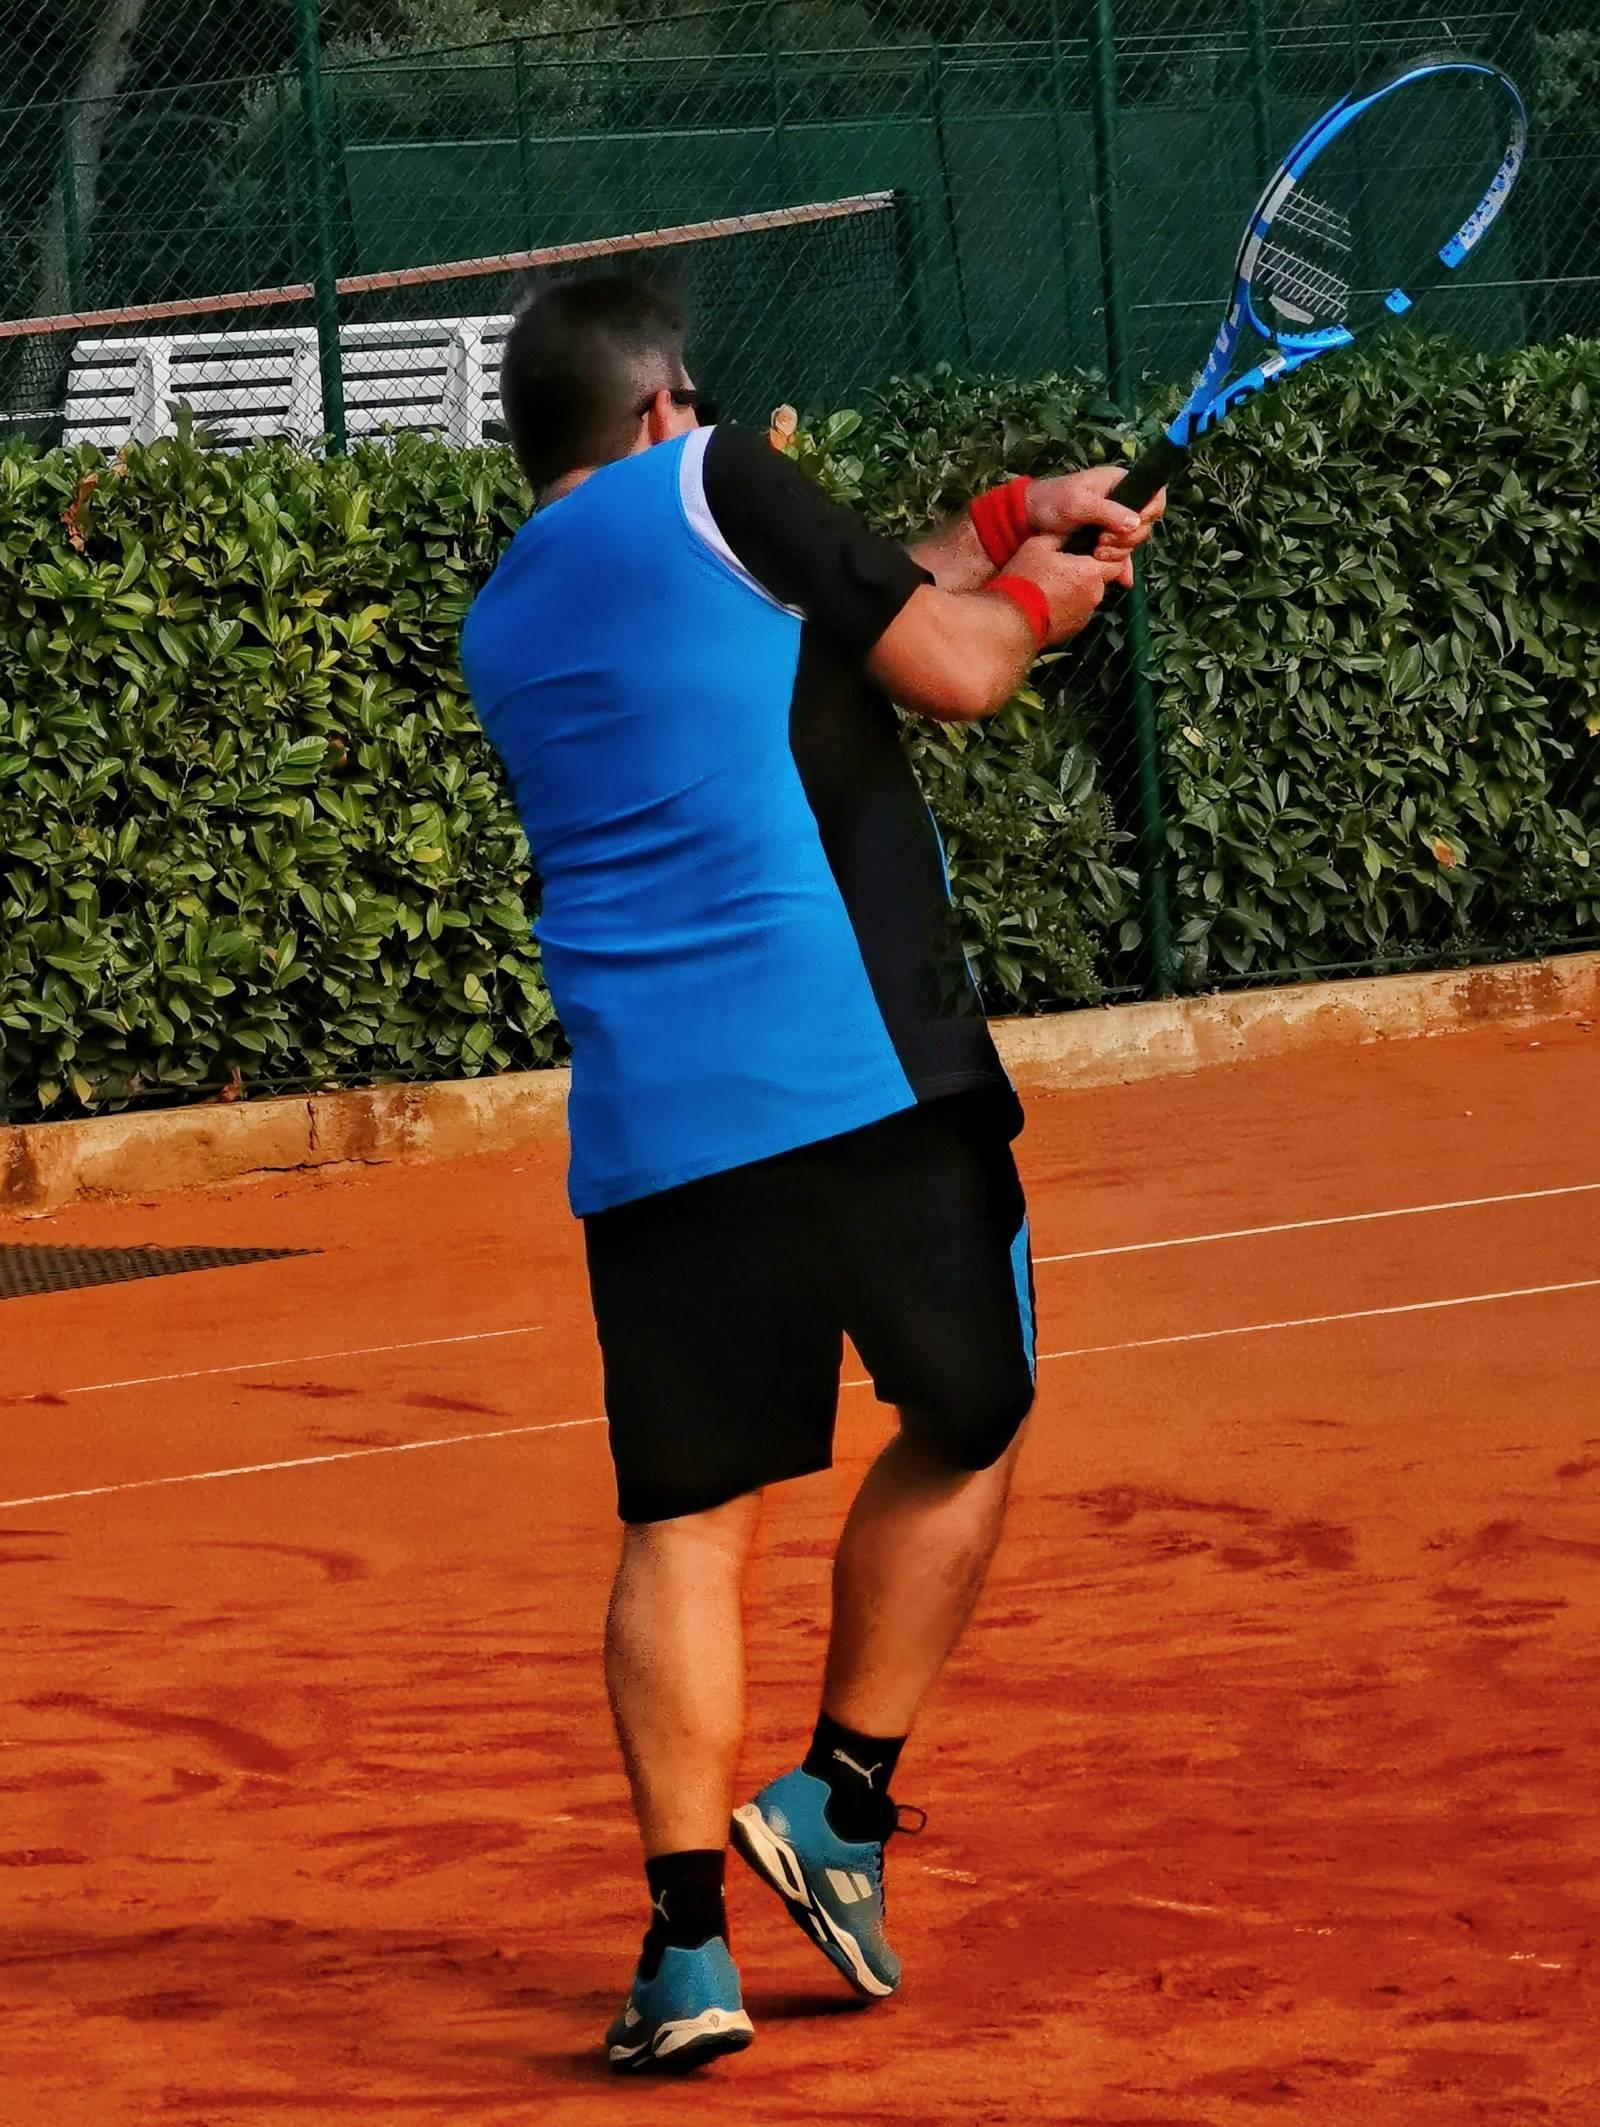 tennis-holidays-croatia-2019-23.jpeg